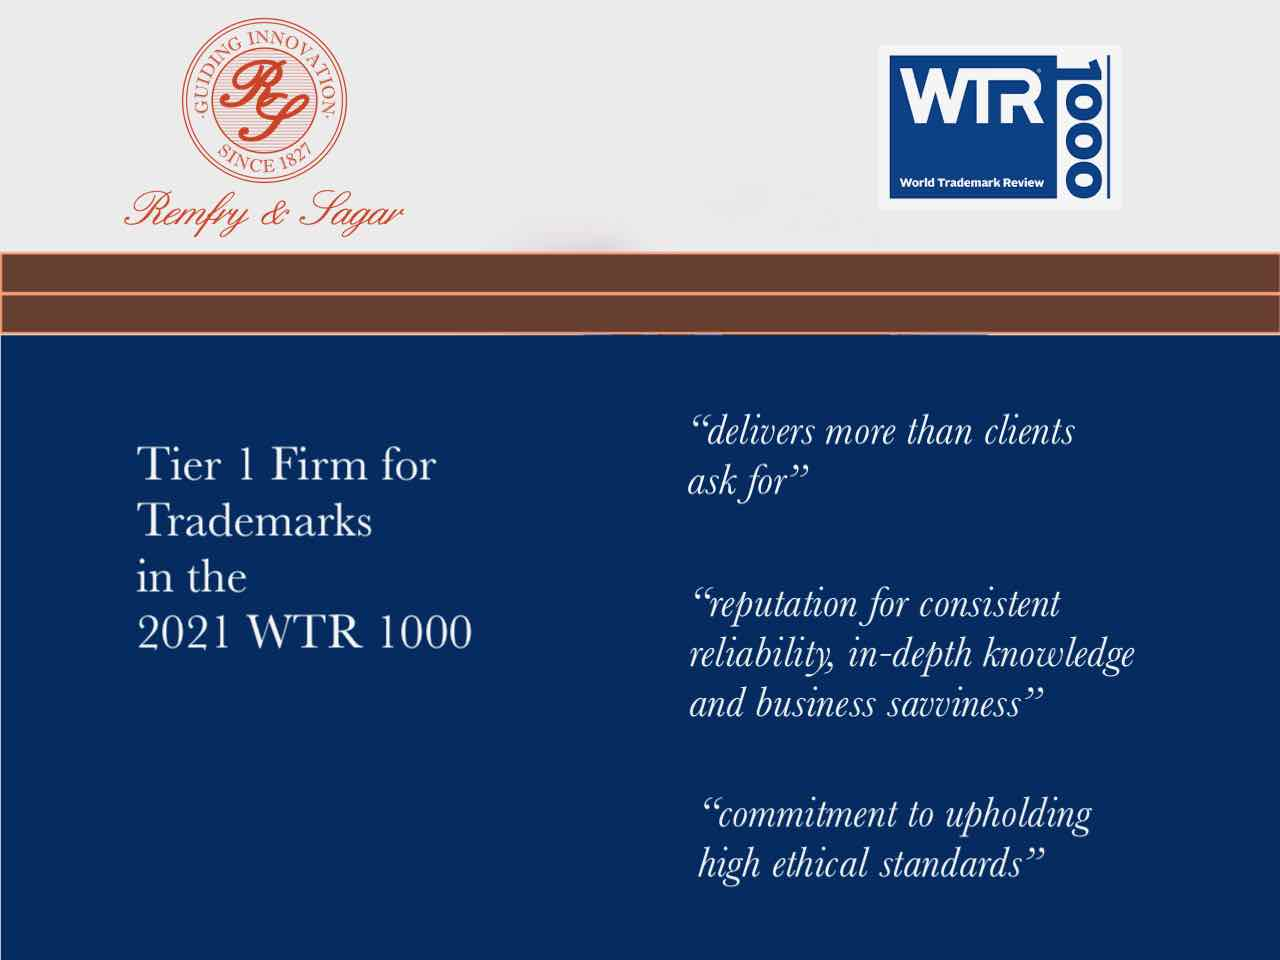 WTR 1000 2021: Remfry & Sagar receives Gold Ranking